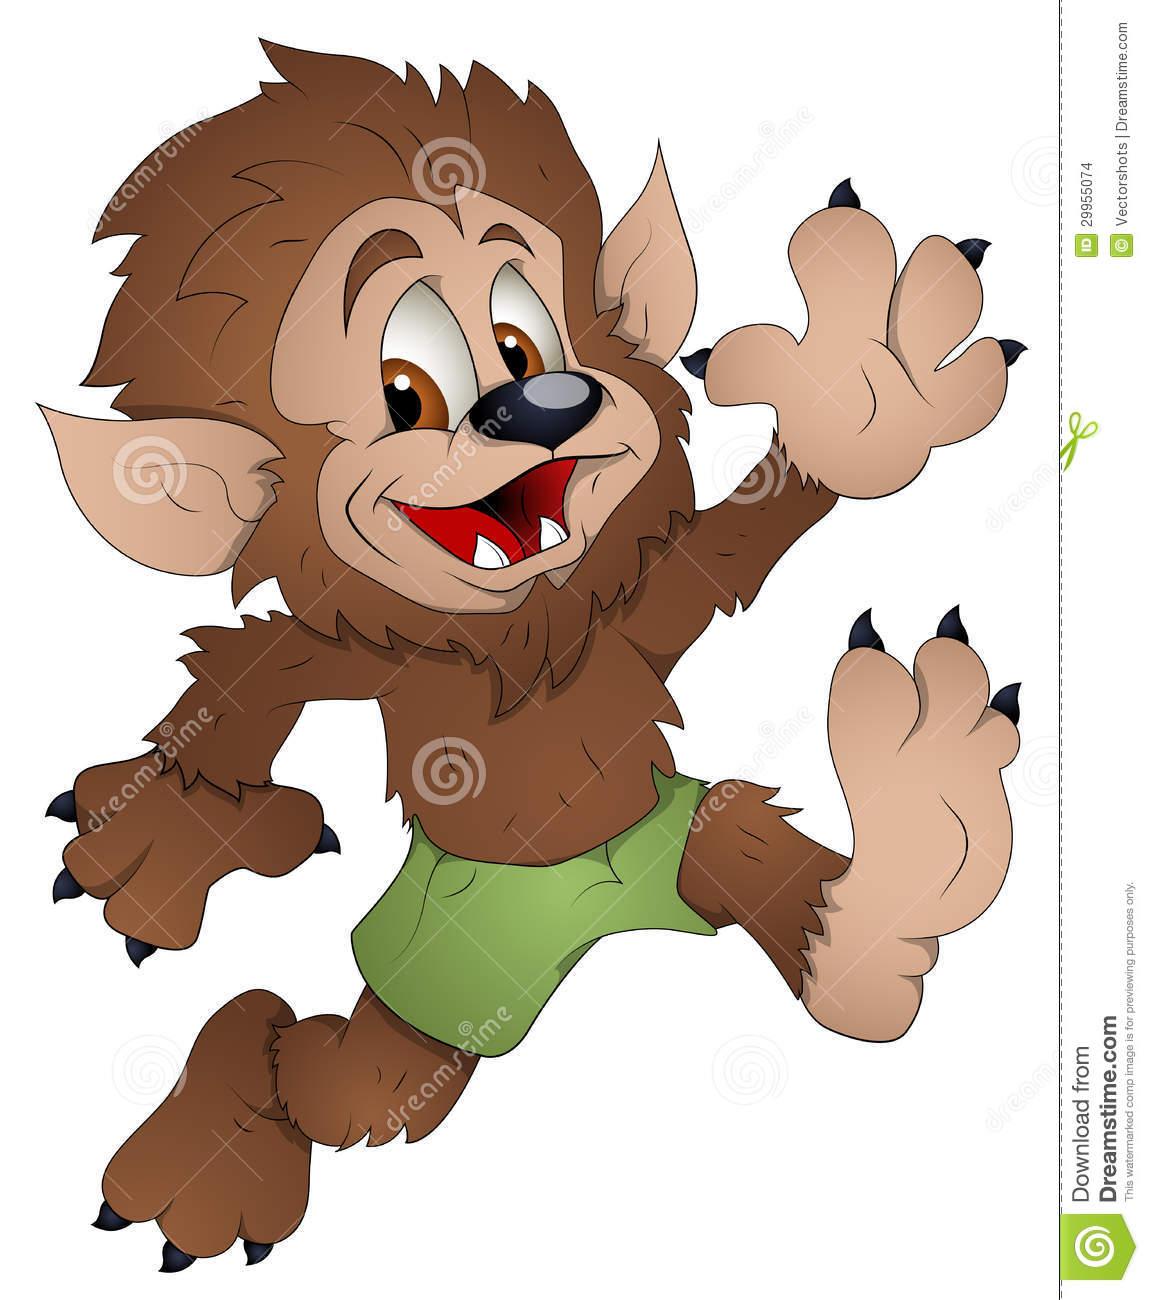 Werewolf clipart smiling  Pinterest Search Google Fall